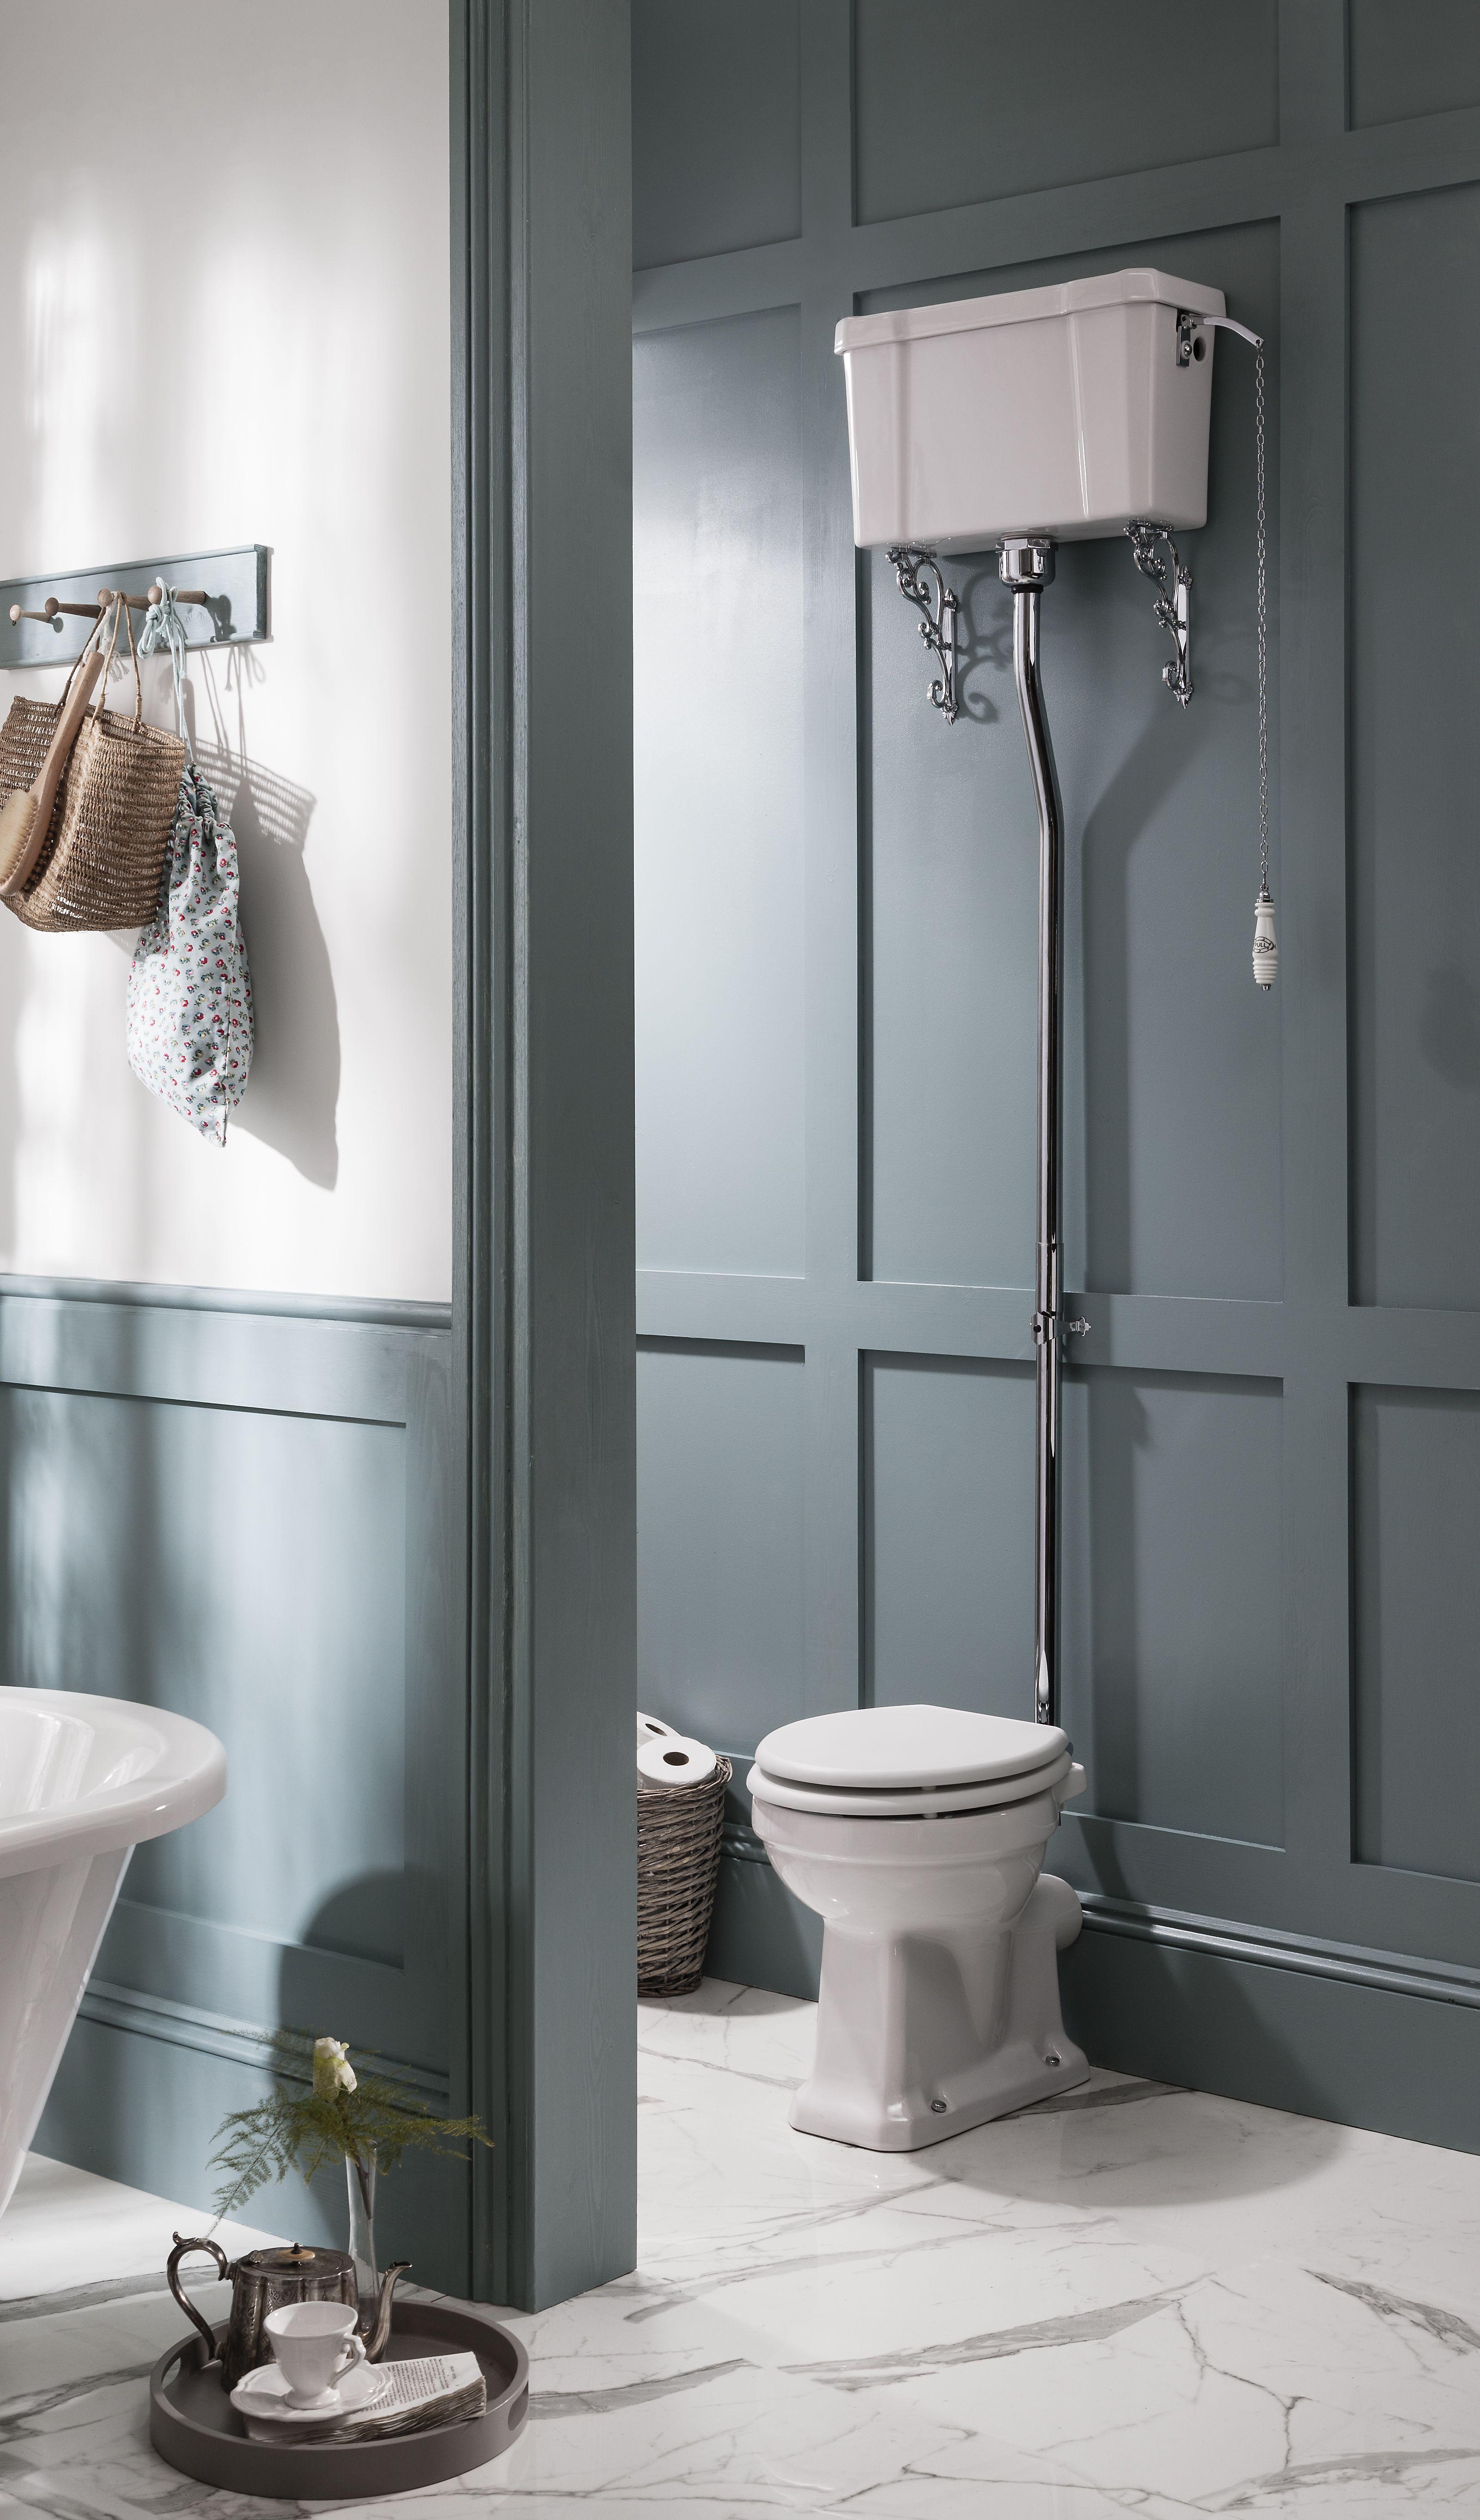 White marble and blue teal nice idea for a bathroom. Period bathroom ...